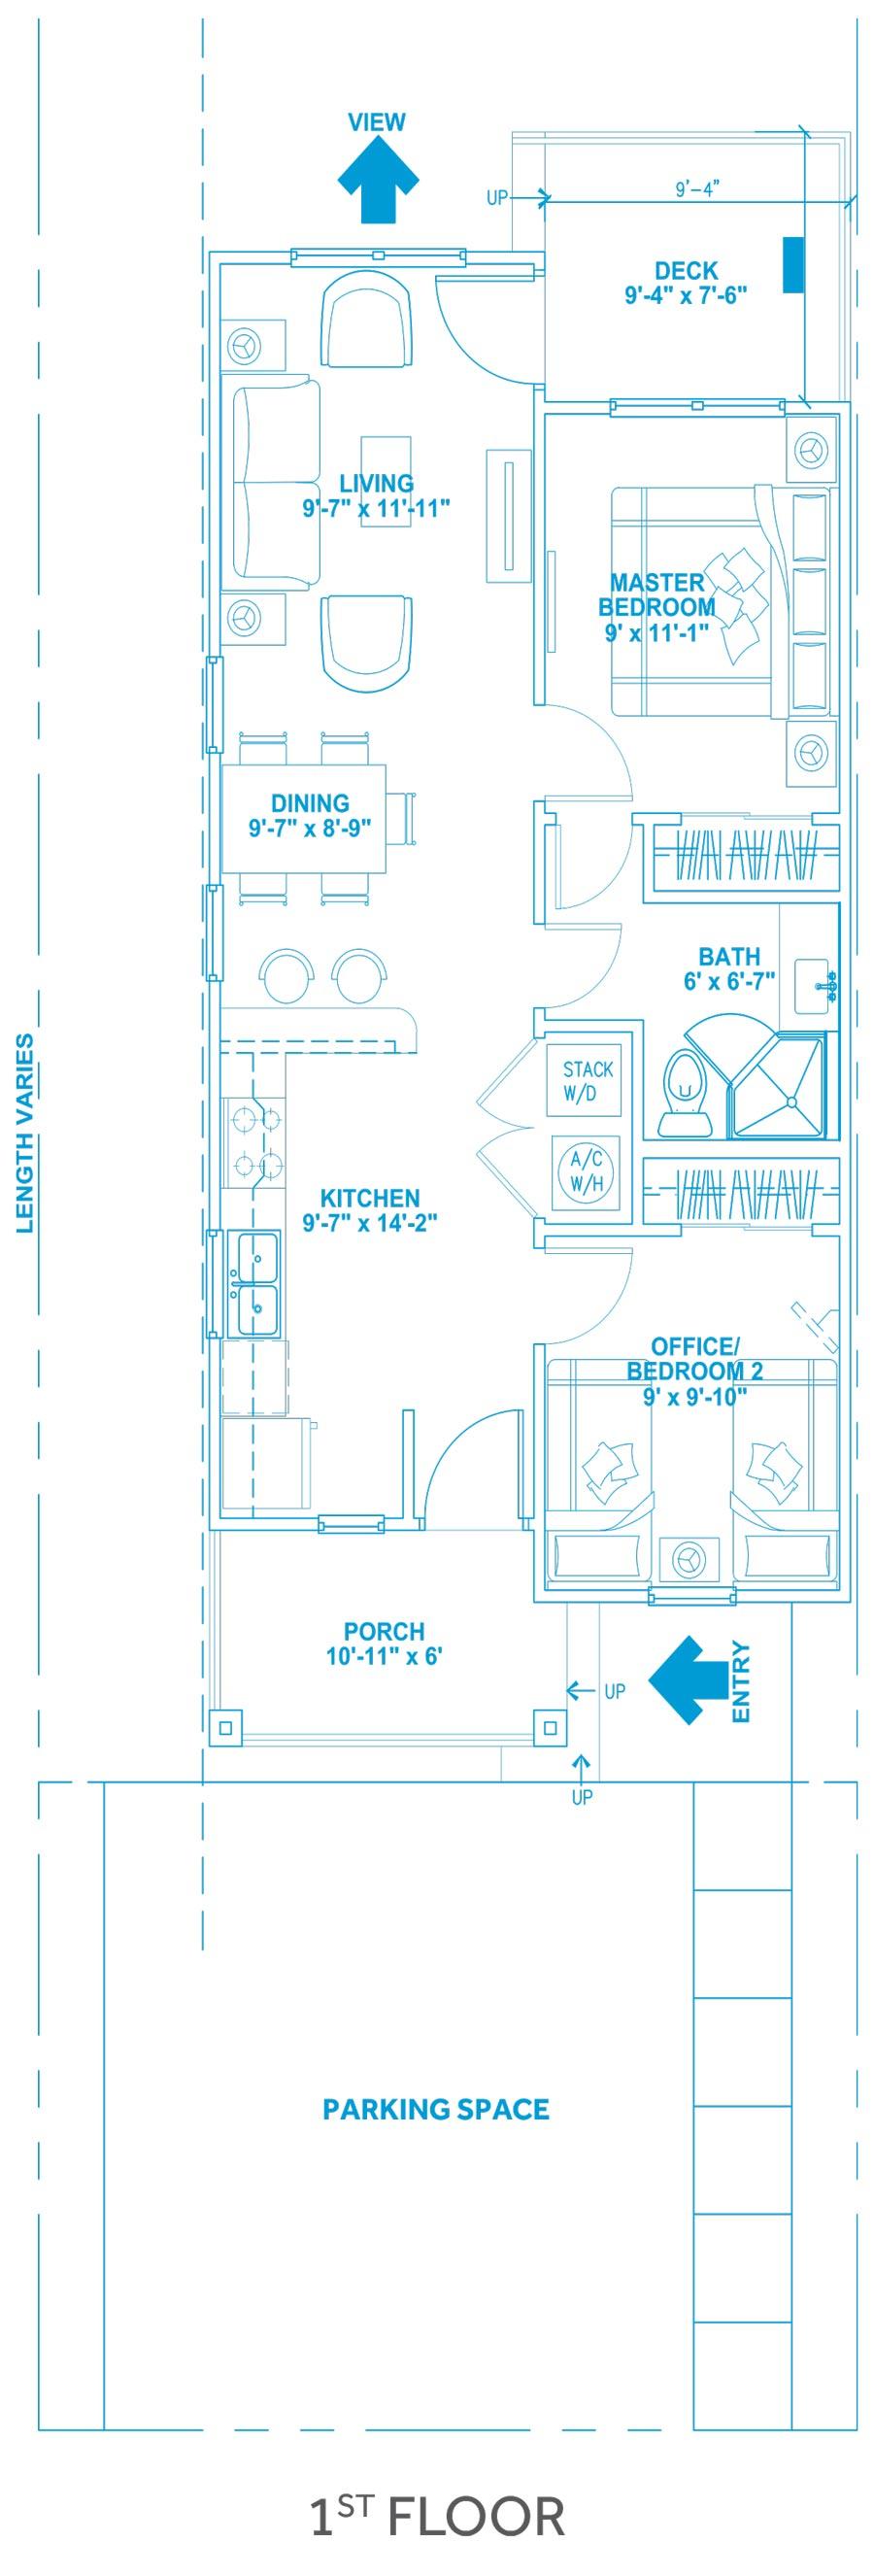 Las Joyas South Padre Beach Houses - Beach House A1 First Floor Plan